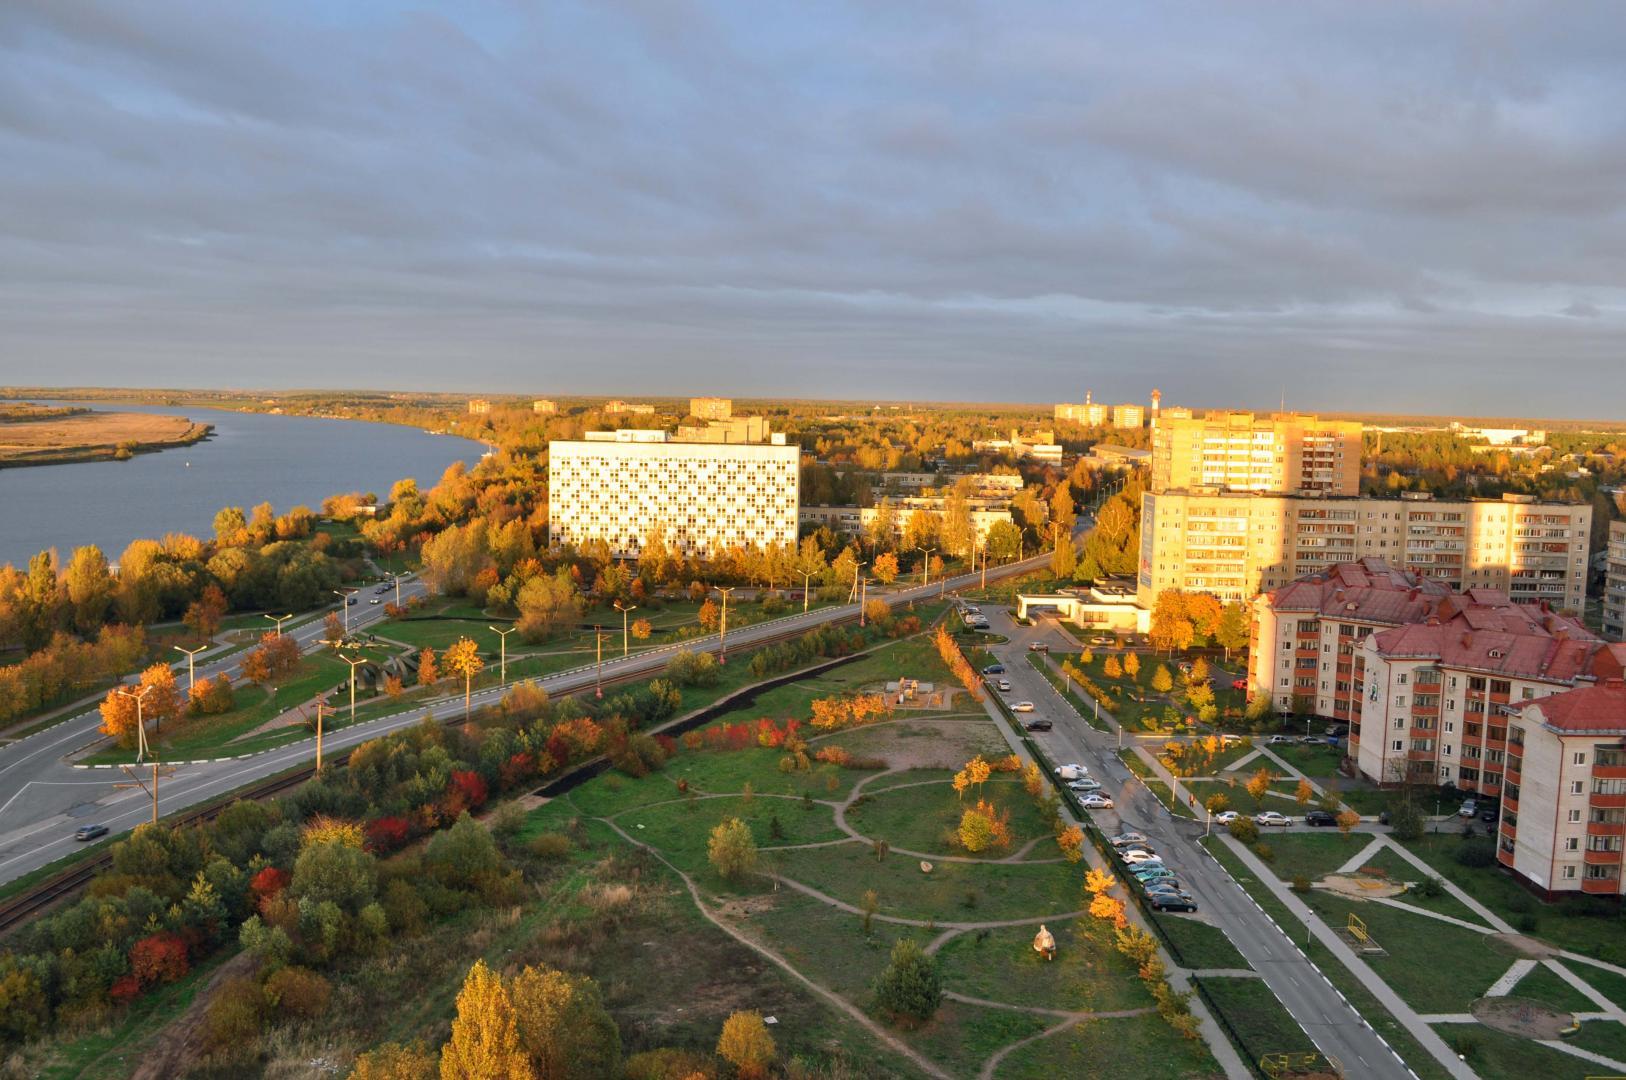 Продается трехкомнатная квартира за 11 800 000 рублей. Дубна, улица Понтекорво, 4.